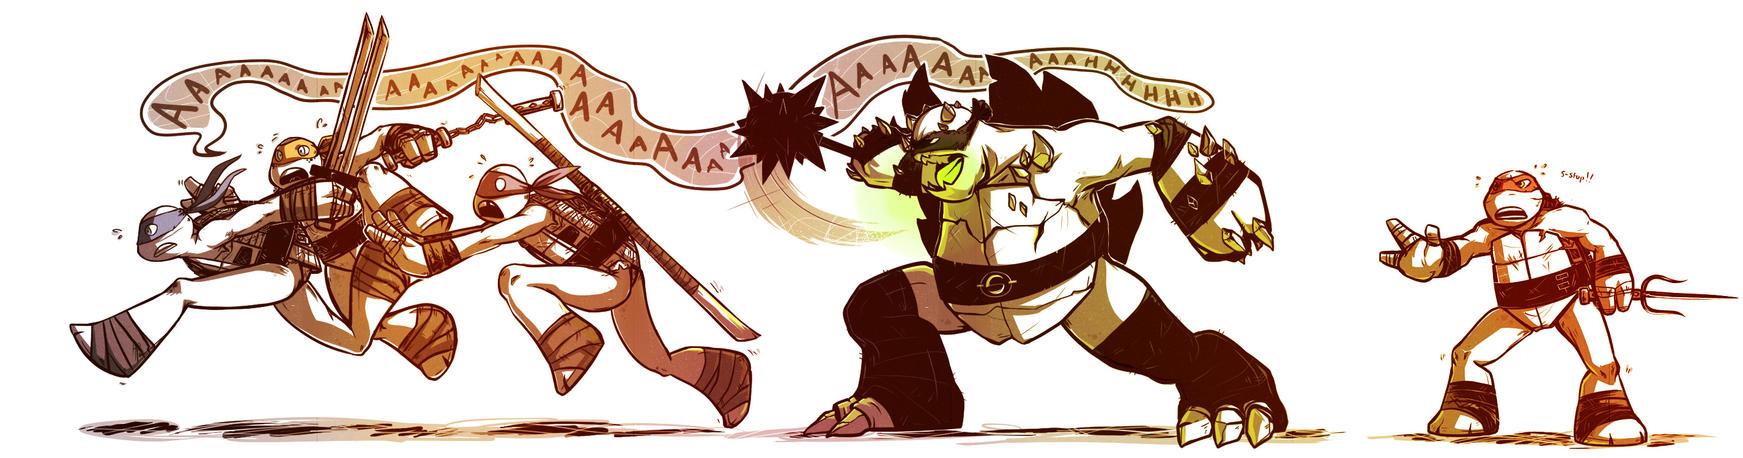 RUN RUN PANIC RUN by pirate-pet